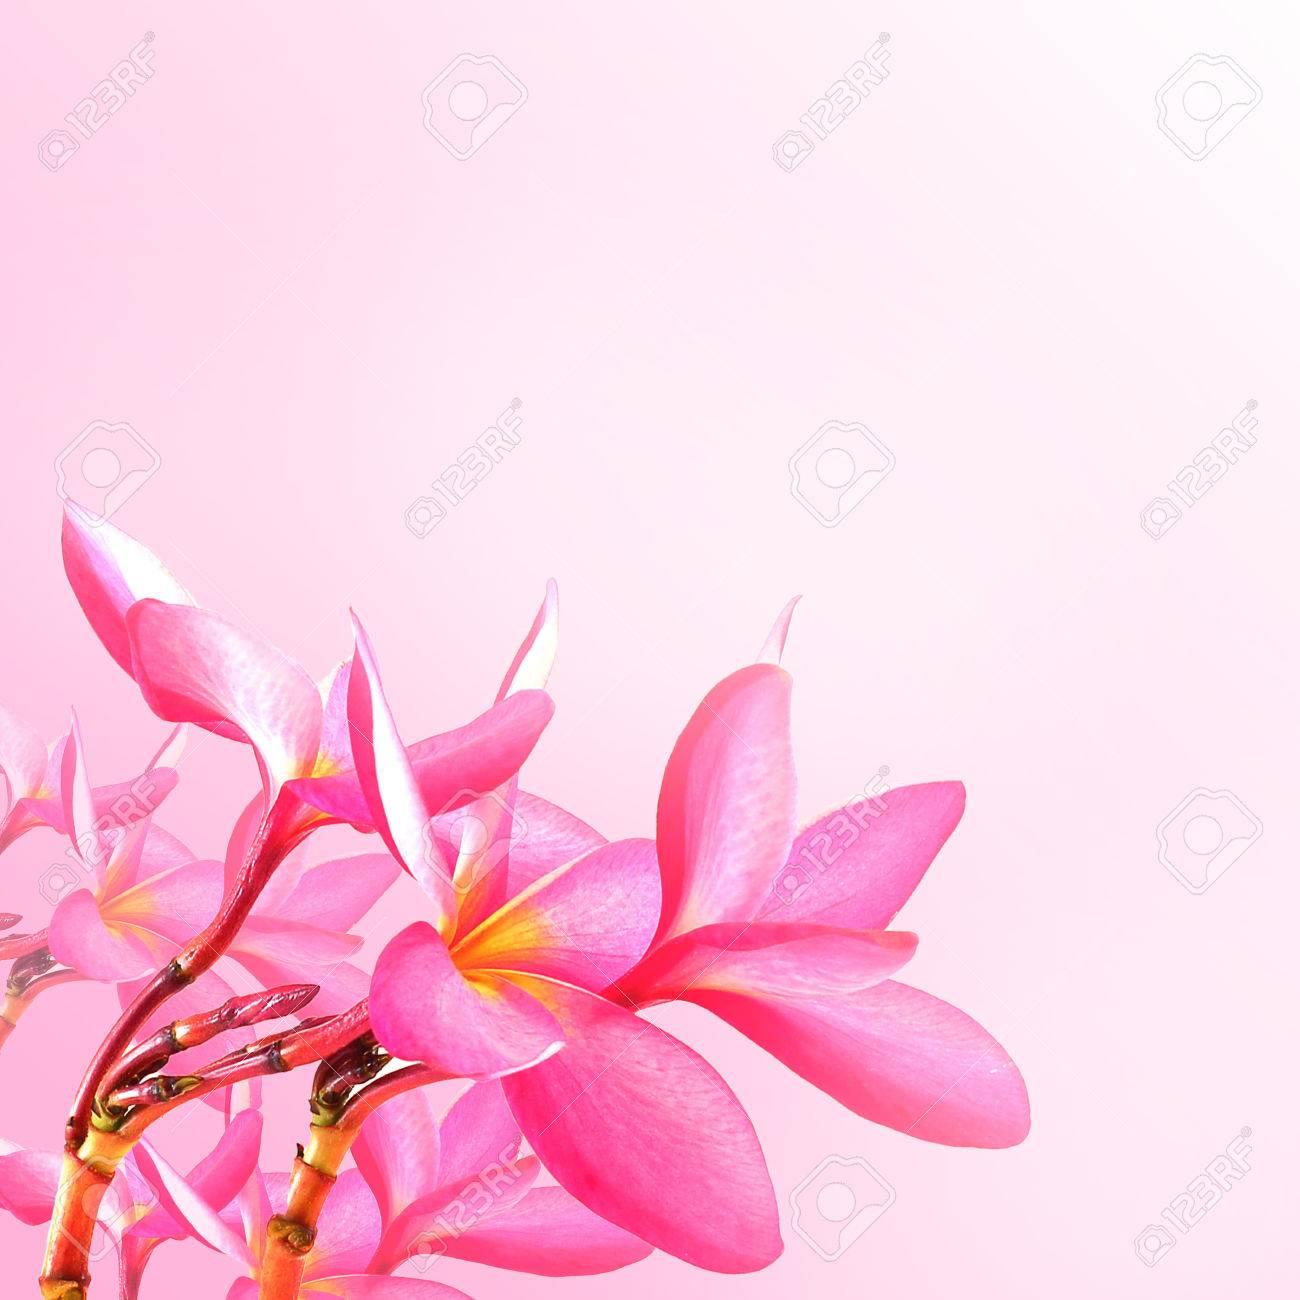 Flower background pink plumeria flowers to create a beautiful stock flower background pink plumeria flowers to create a beautiful stock photo 28137602 mightylinksfo